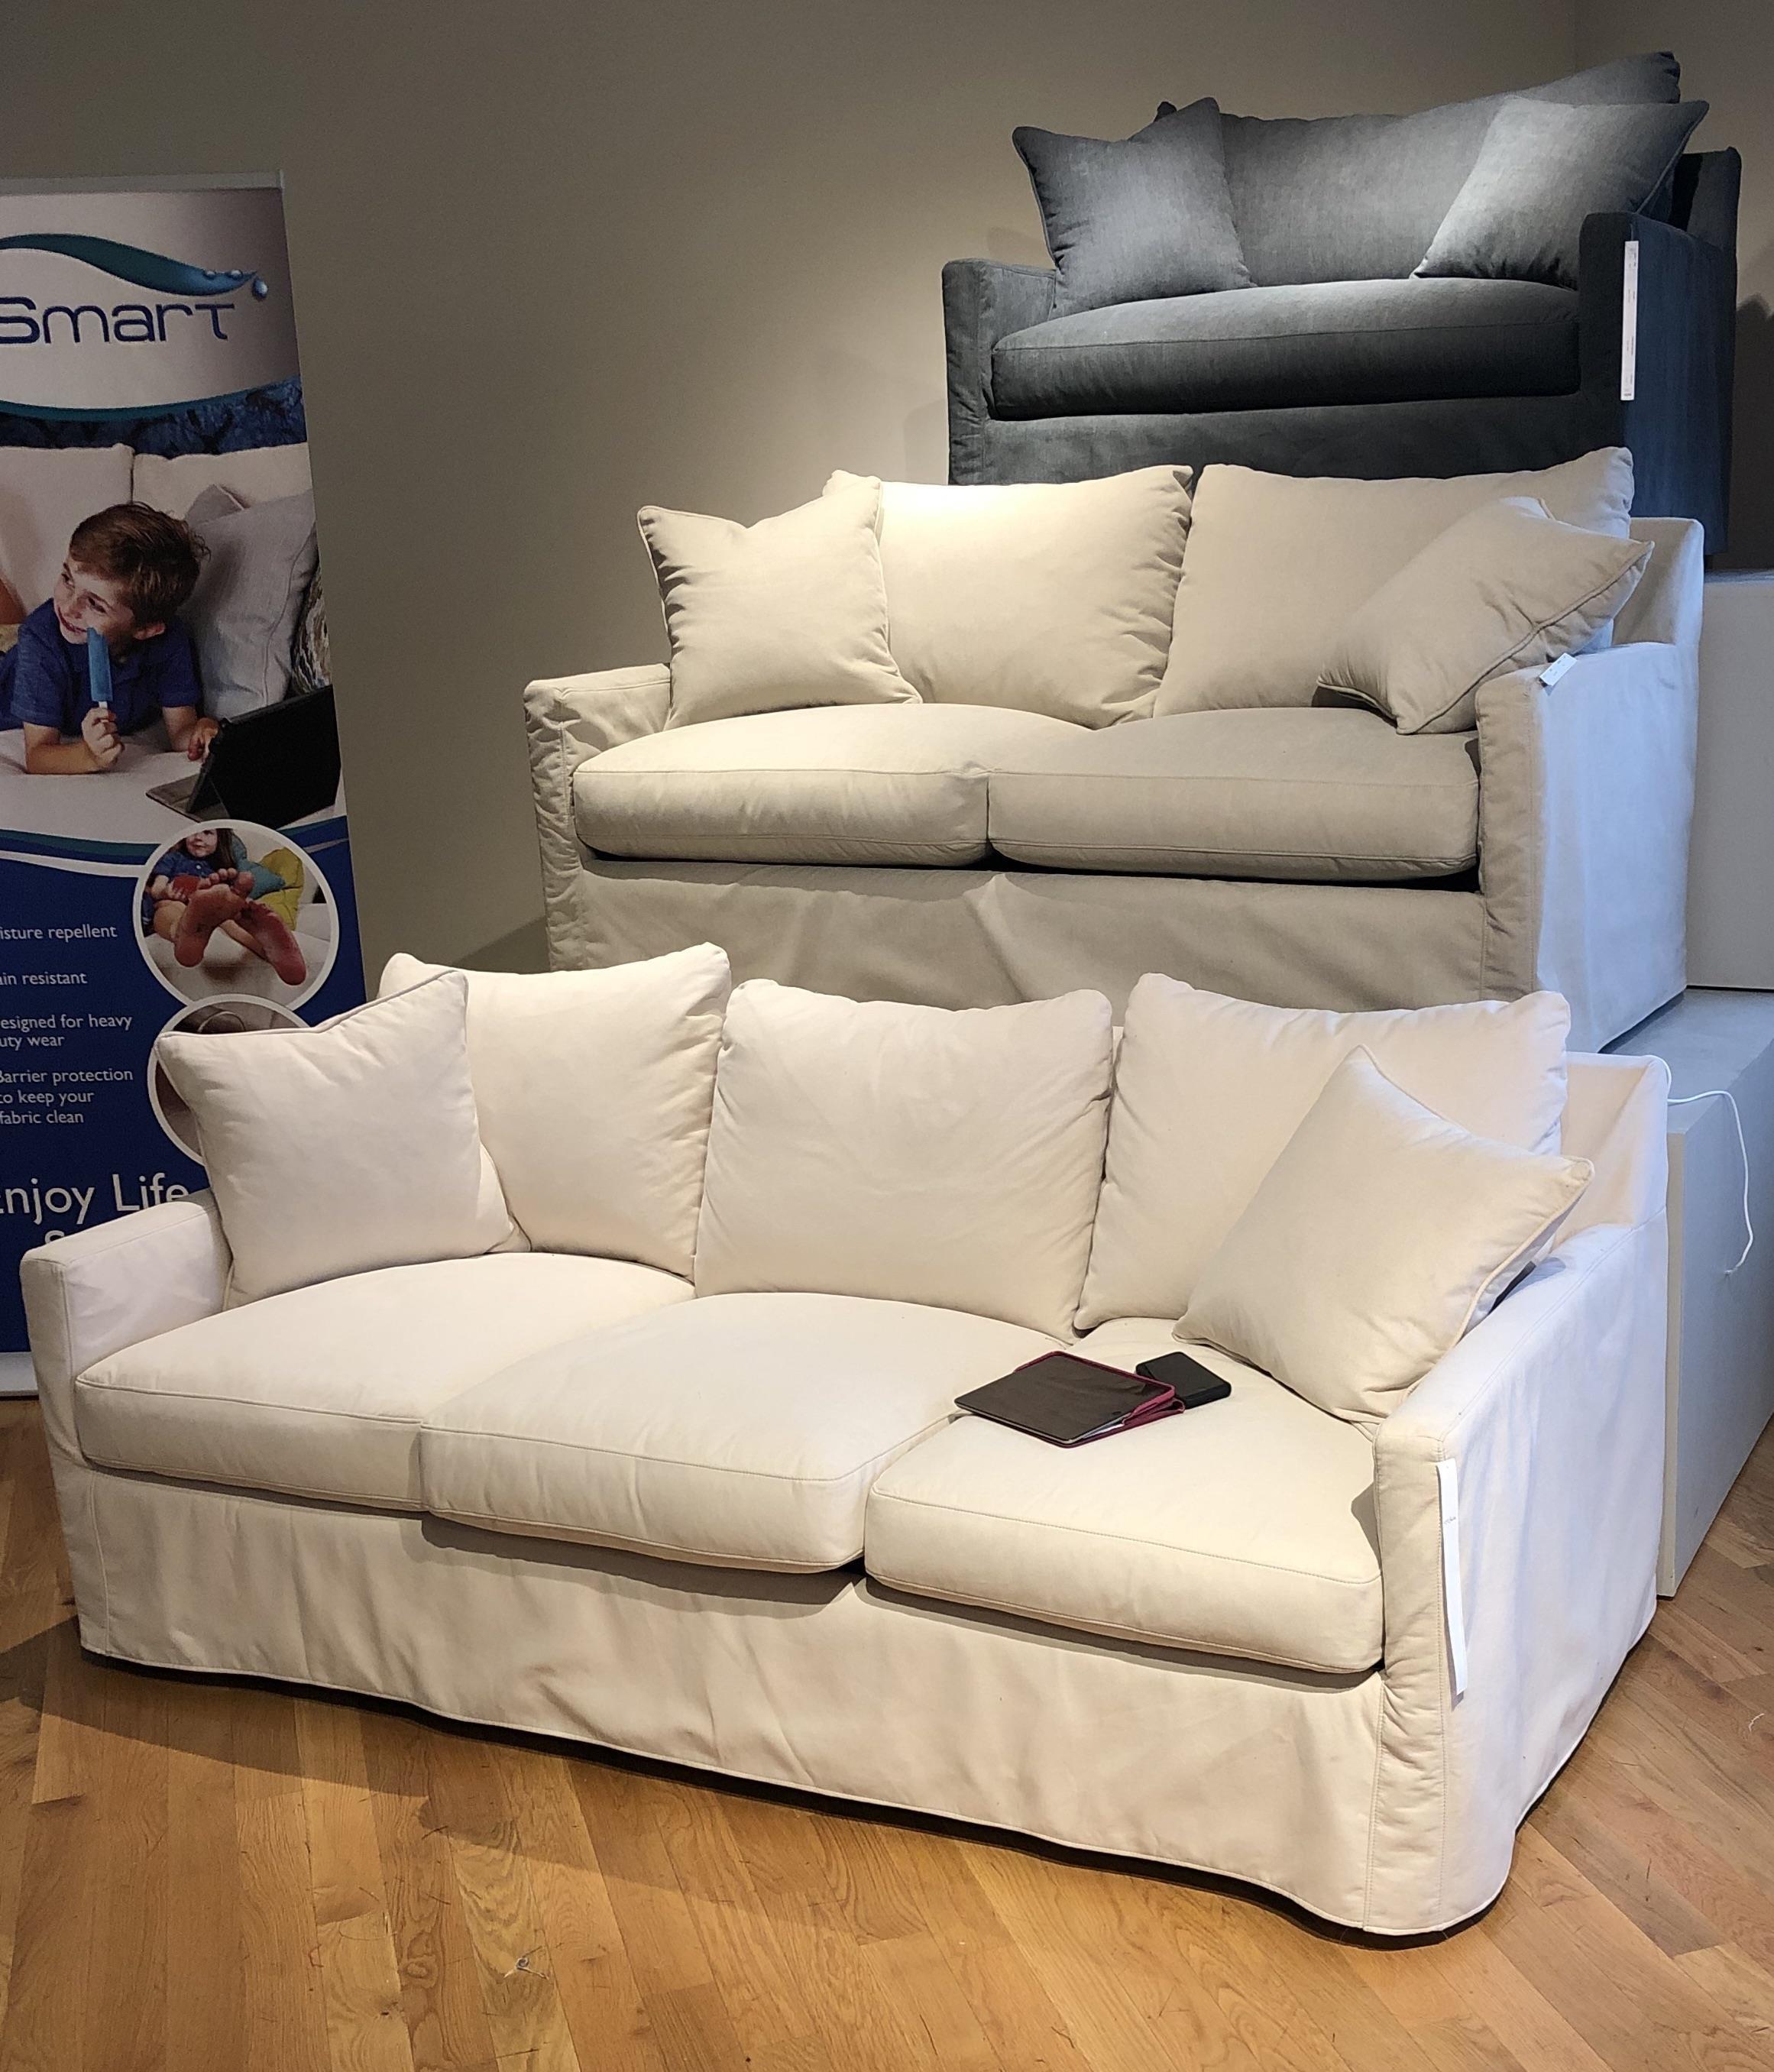 - 1538 Down Twin Size Memory Foam Sleeper Sofa Reeds Furniture